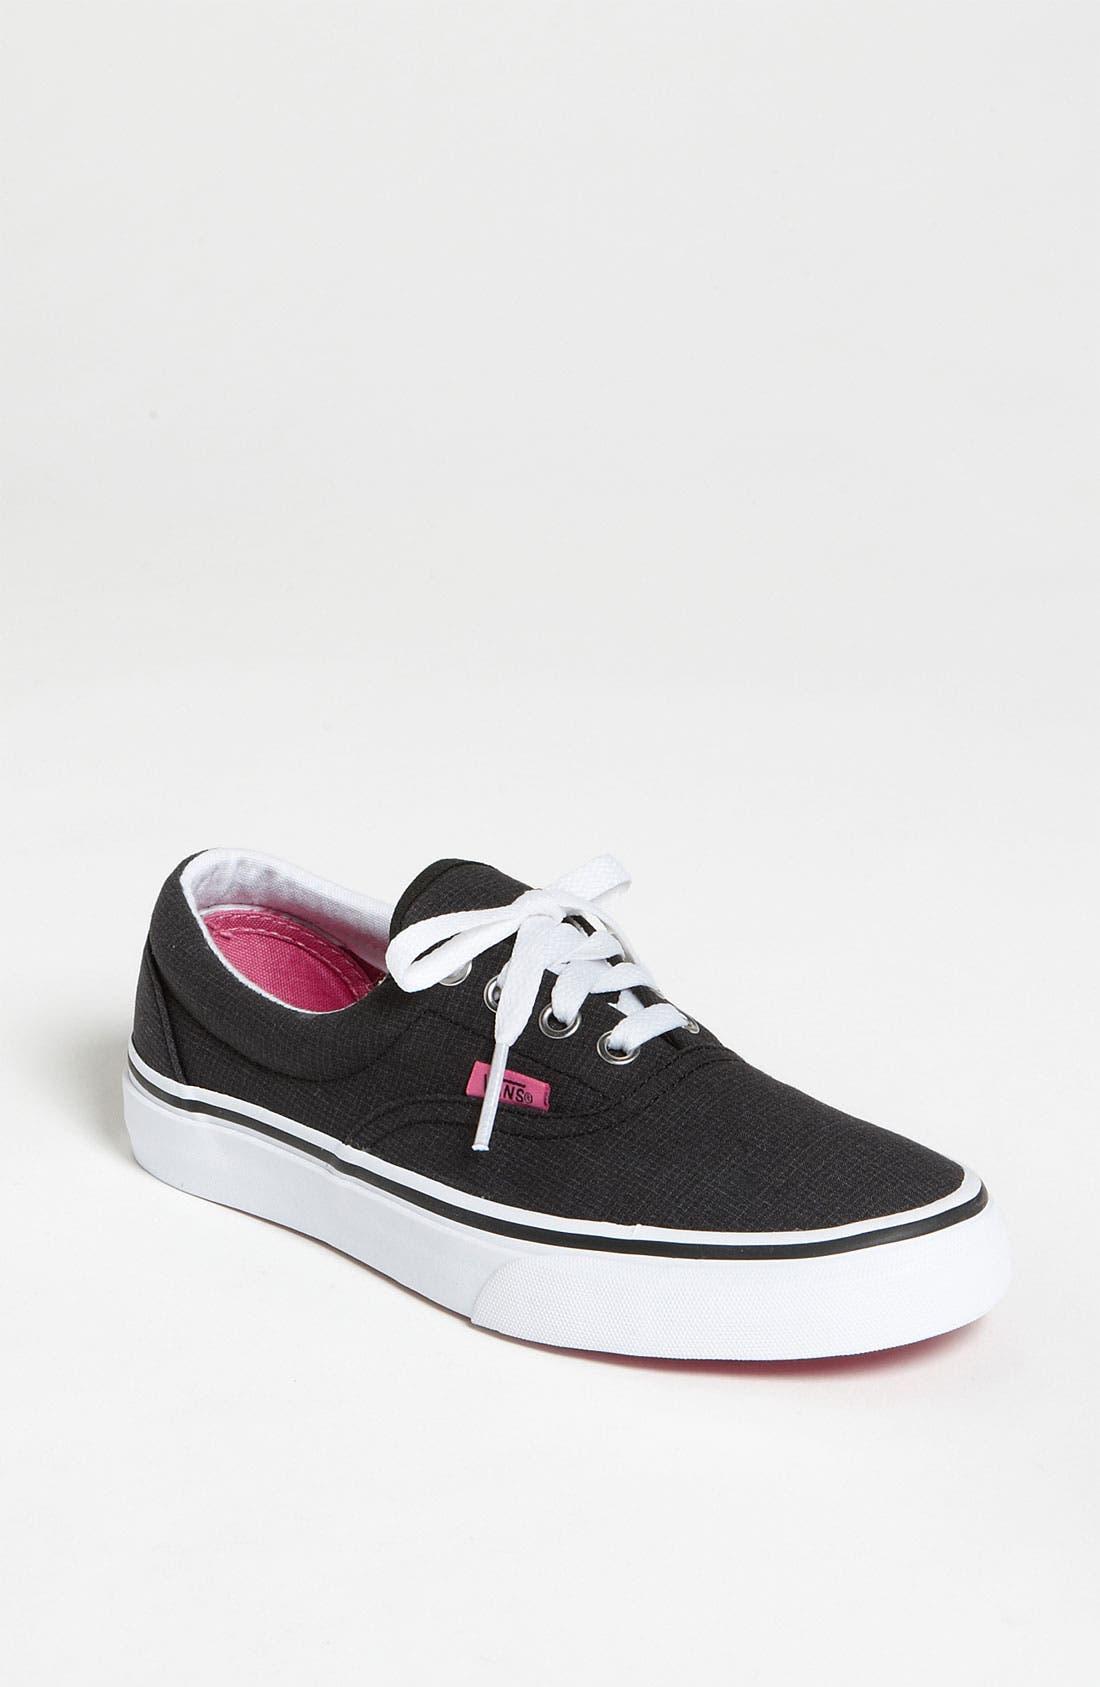 Main Image - Vans 'Authentic - Dressy' Sneaker (Women)